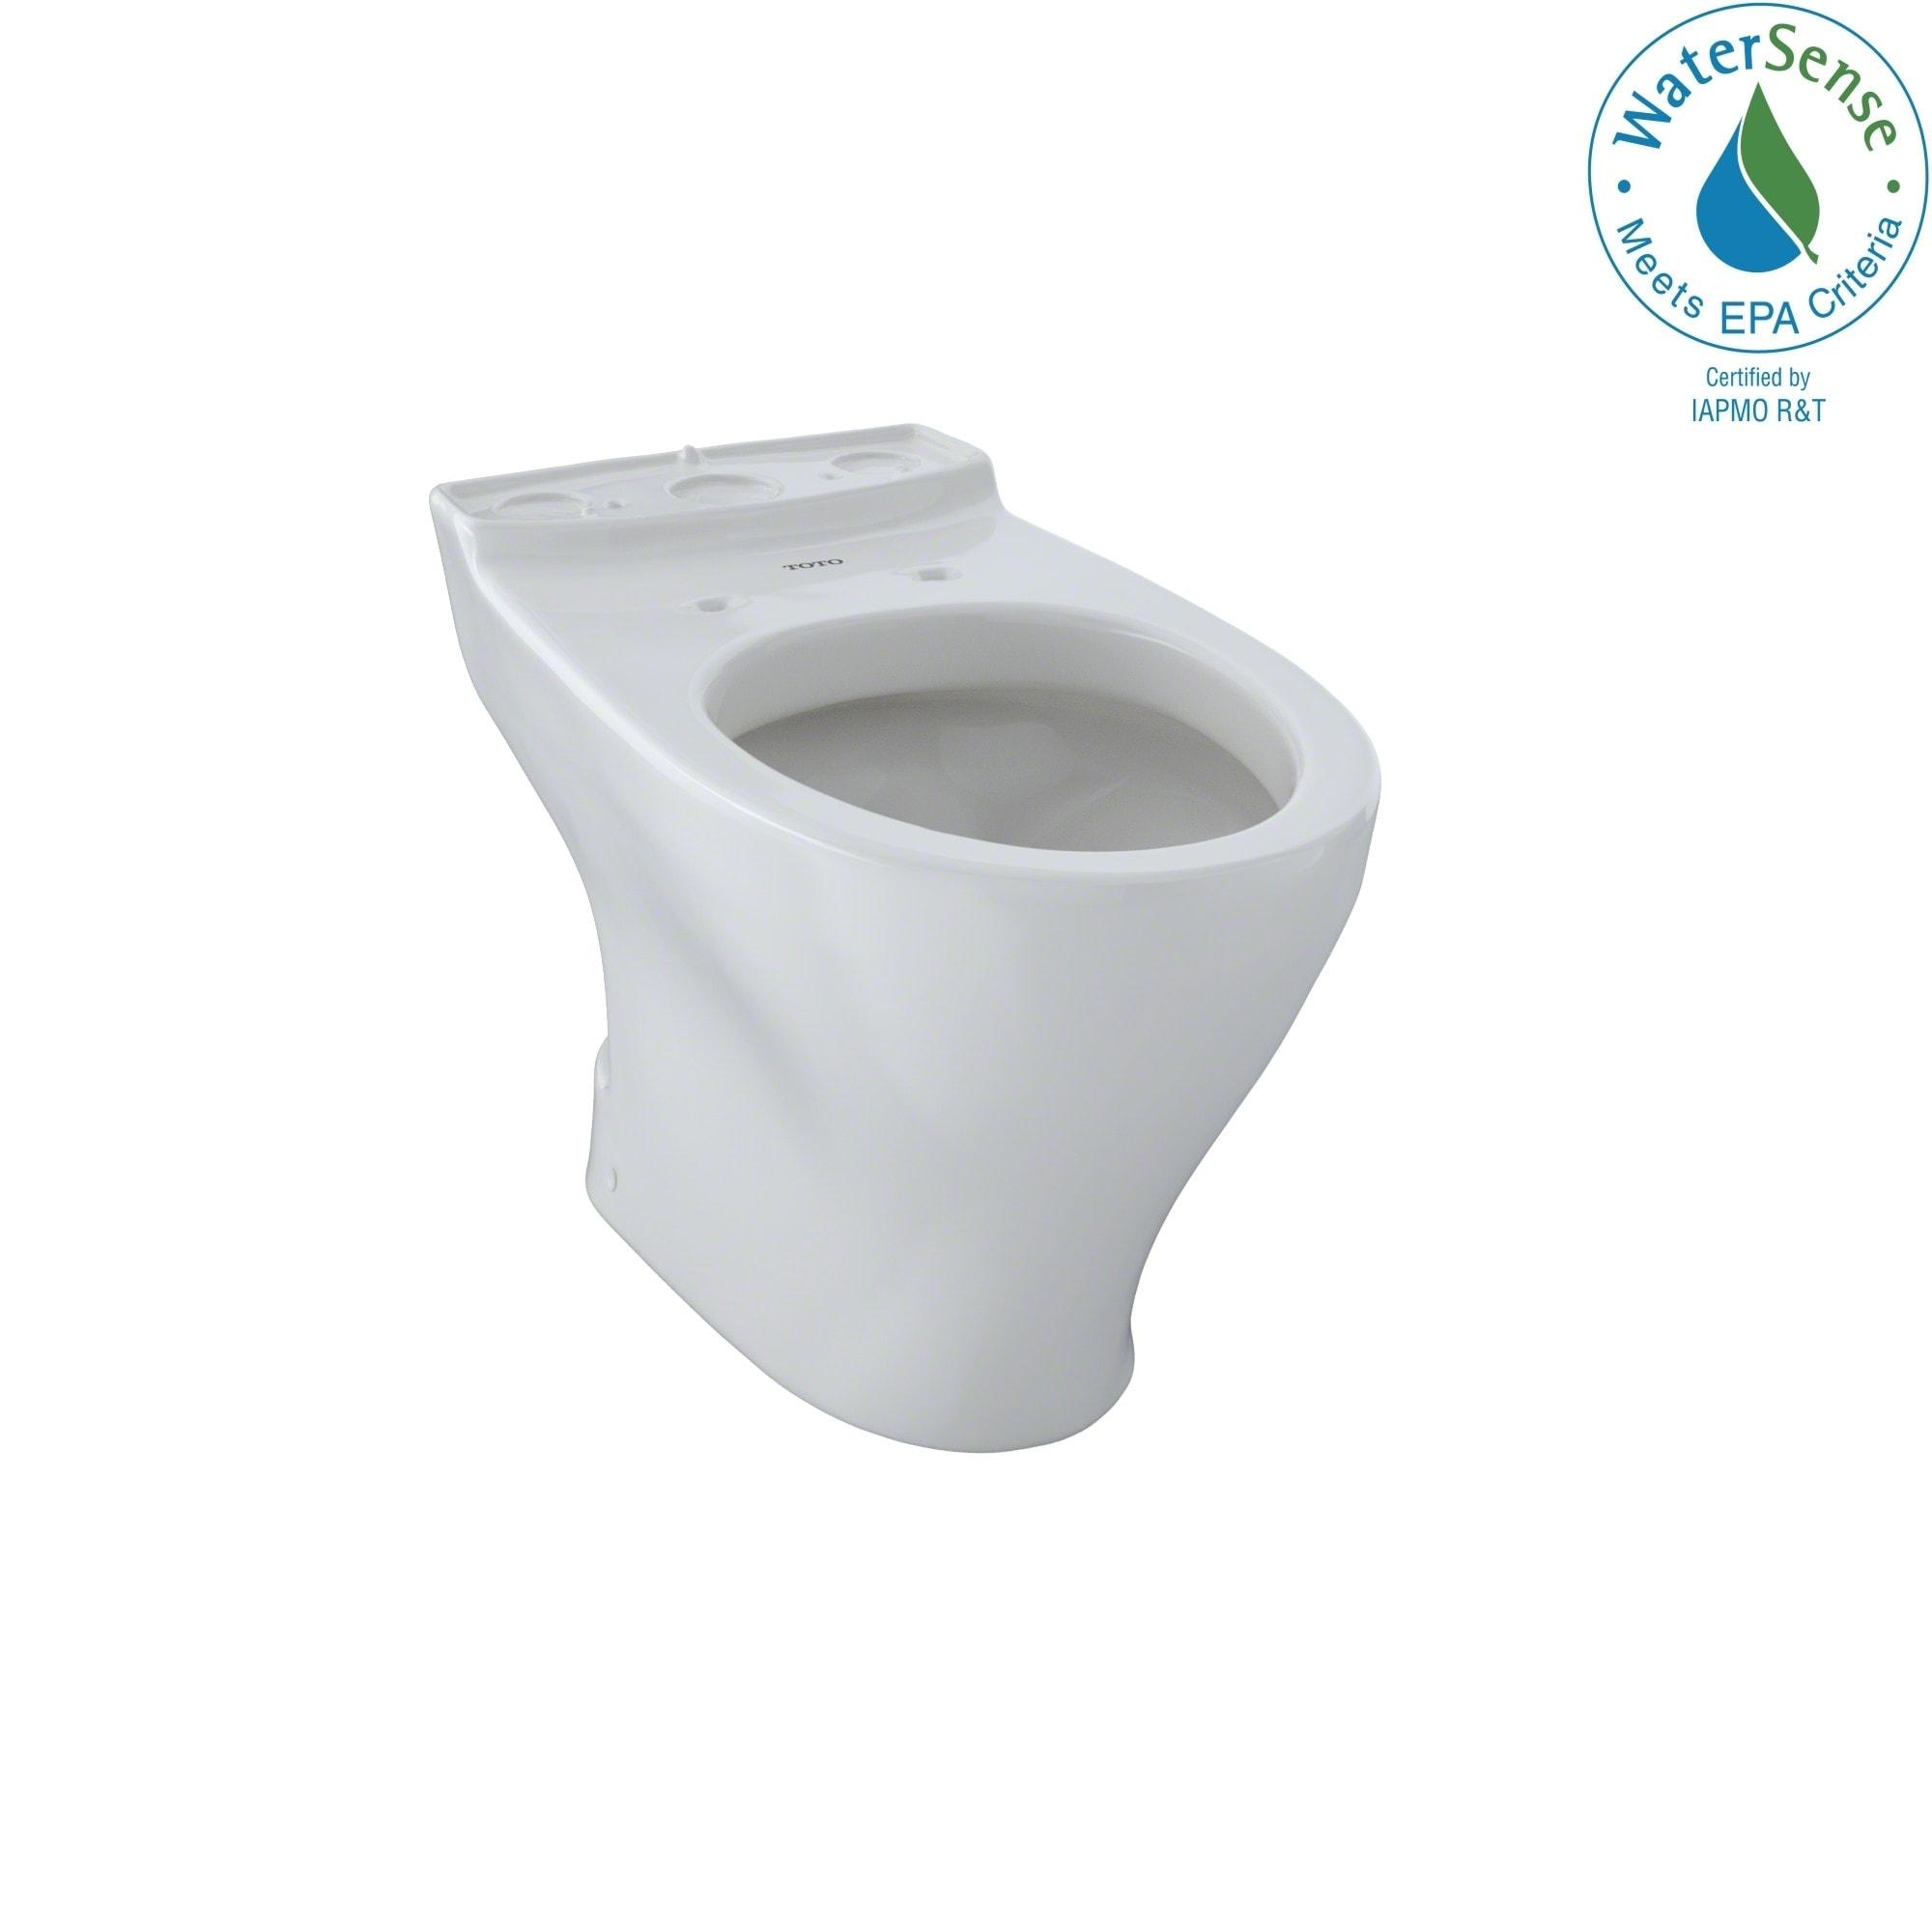 Toto Dual Flush Toilet Bowl Colonial White (Colonial White)